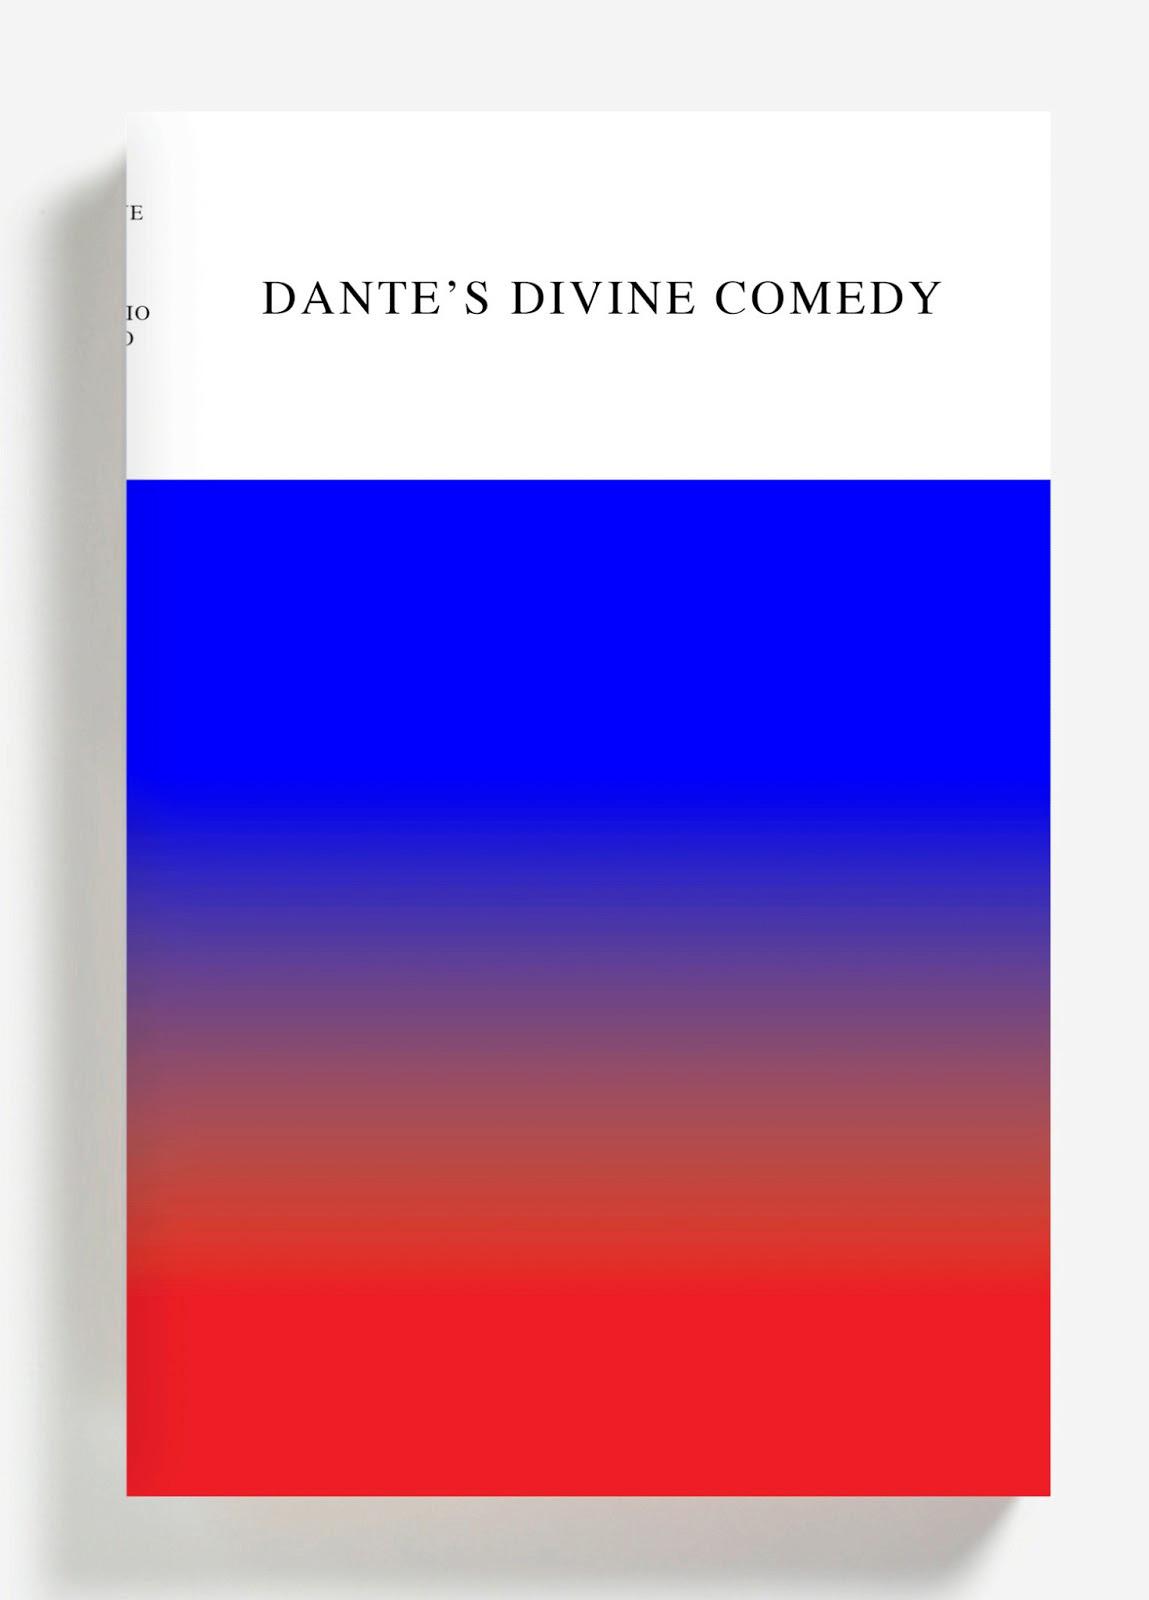 """Dante's Divine Comedy"" (diseño de cubierta por Peter Mendelsund)"